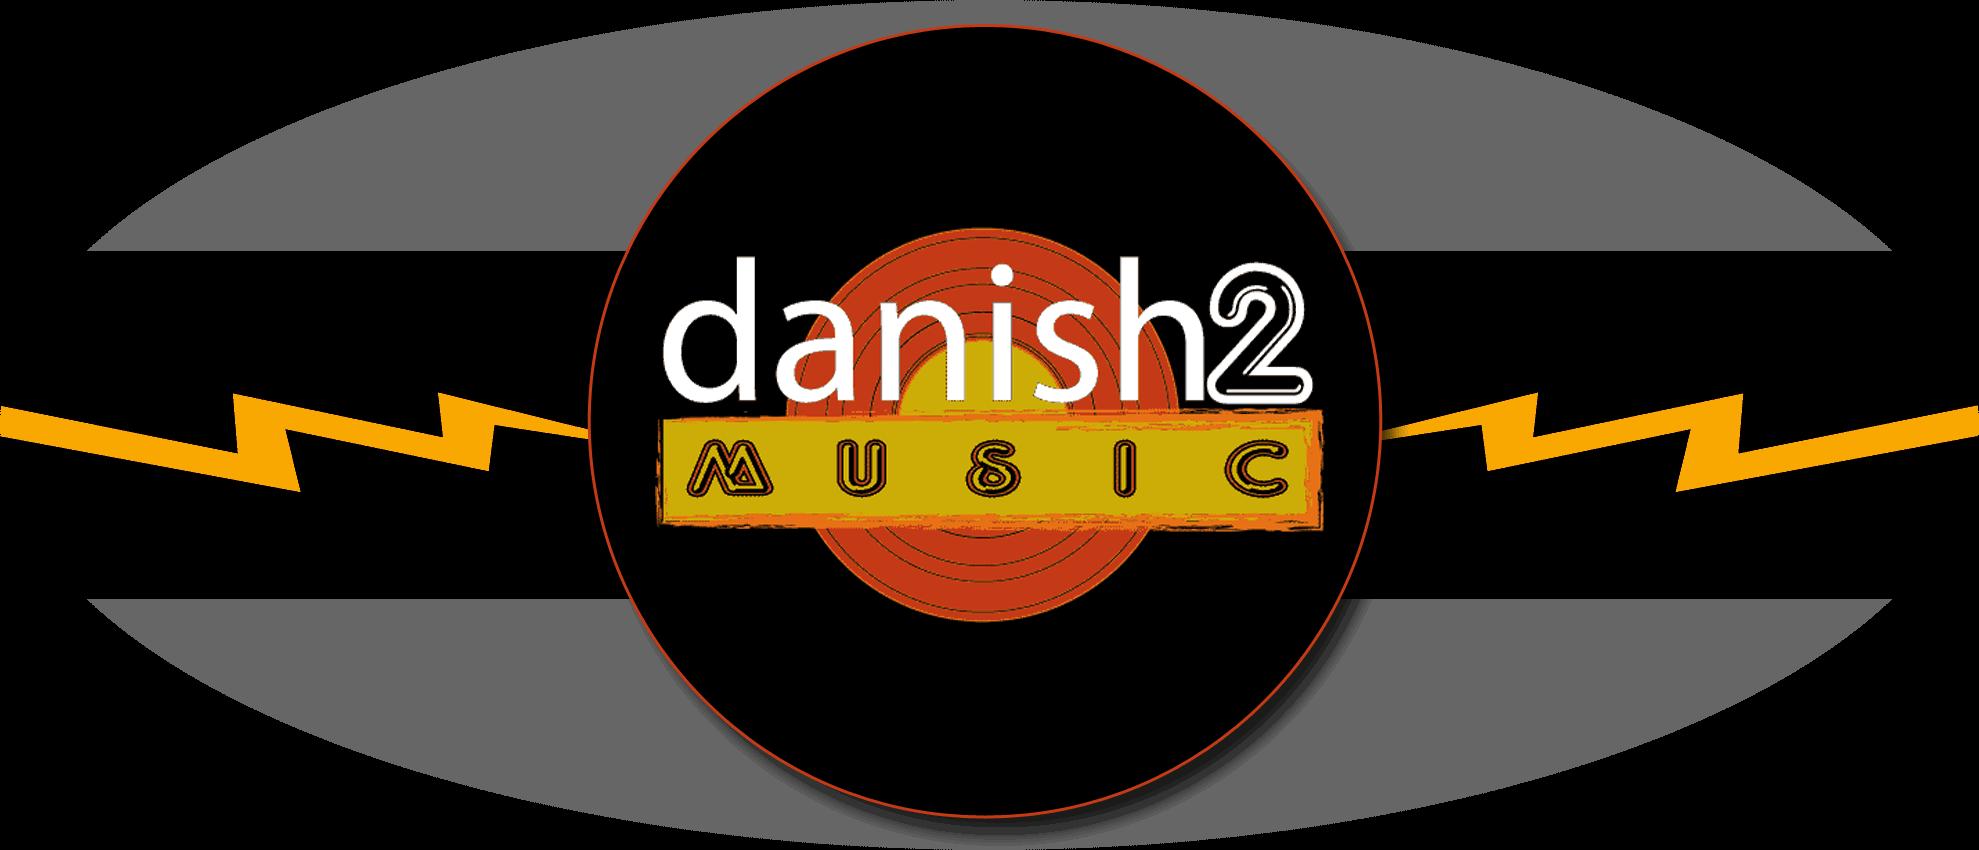 danish2music, Stefan Hallerbach